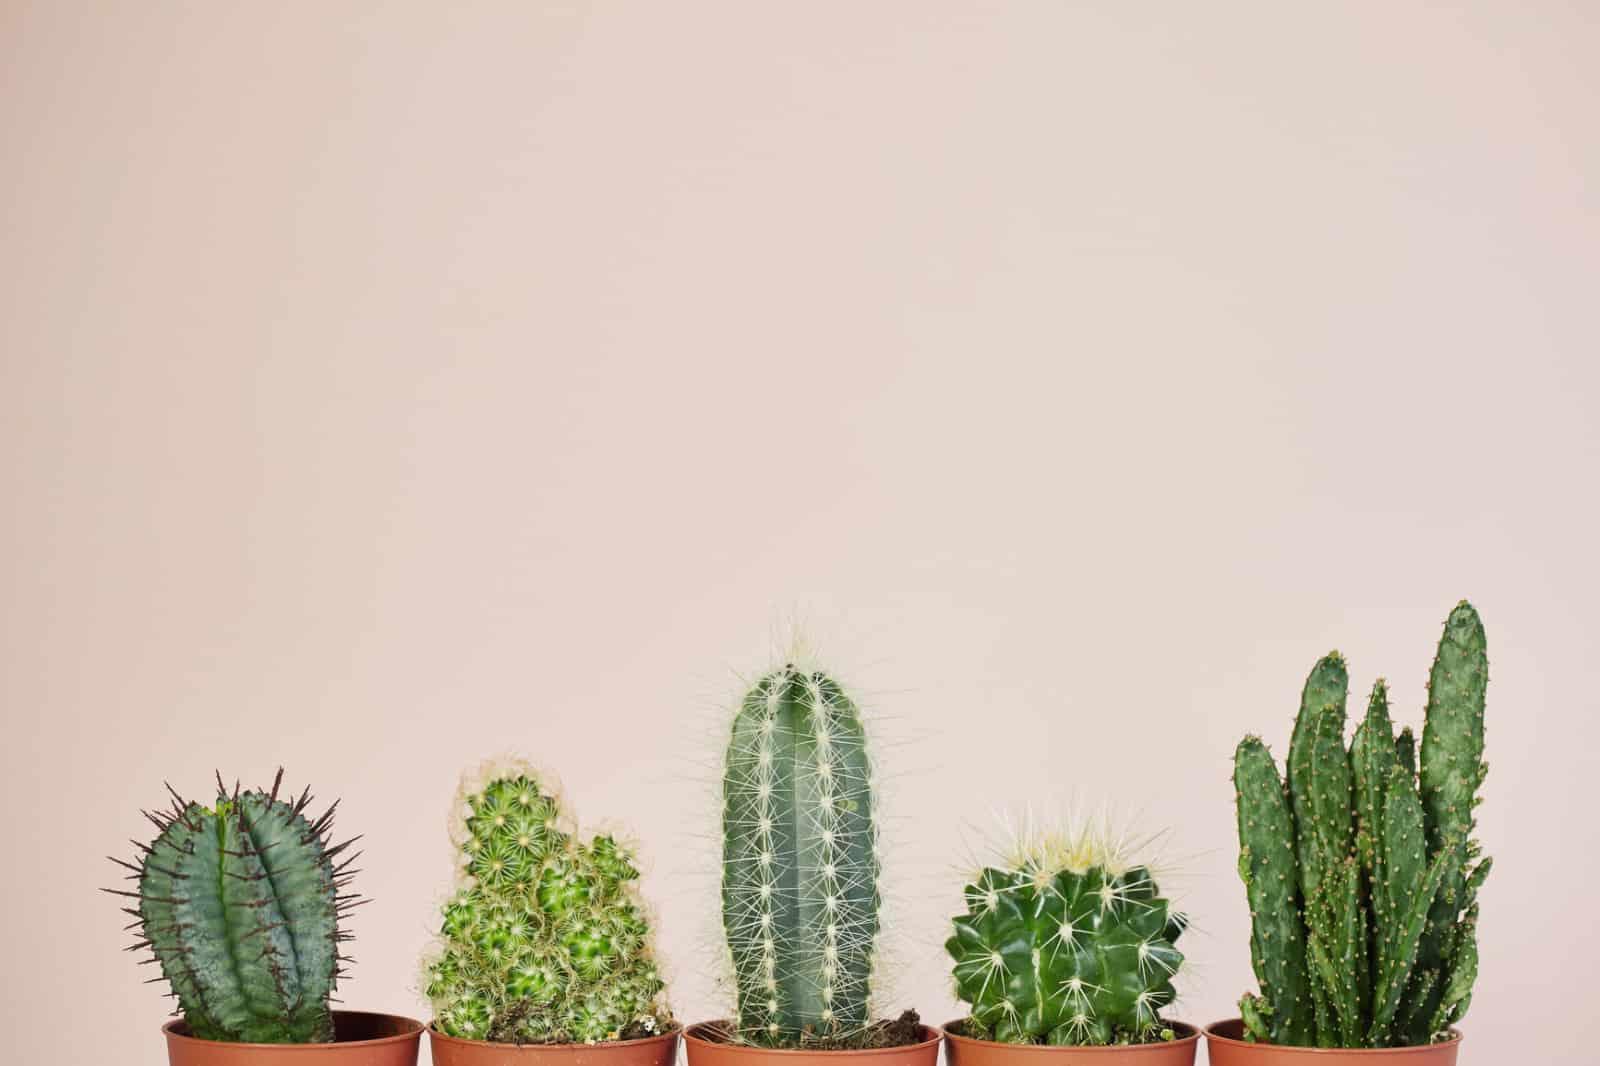 Cactus plants representing R&D tax credit eligibility criteria